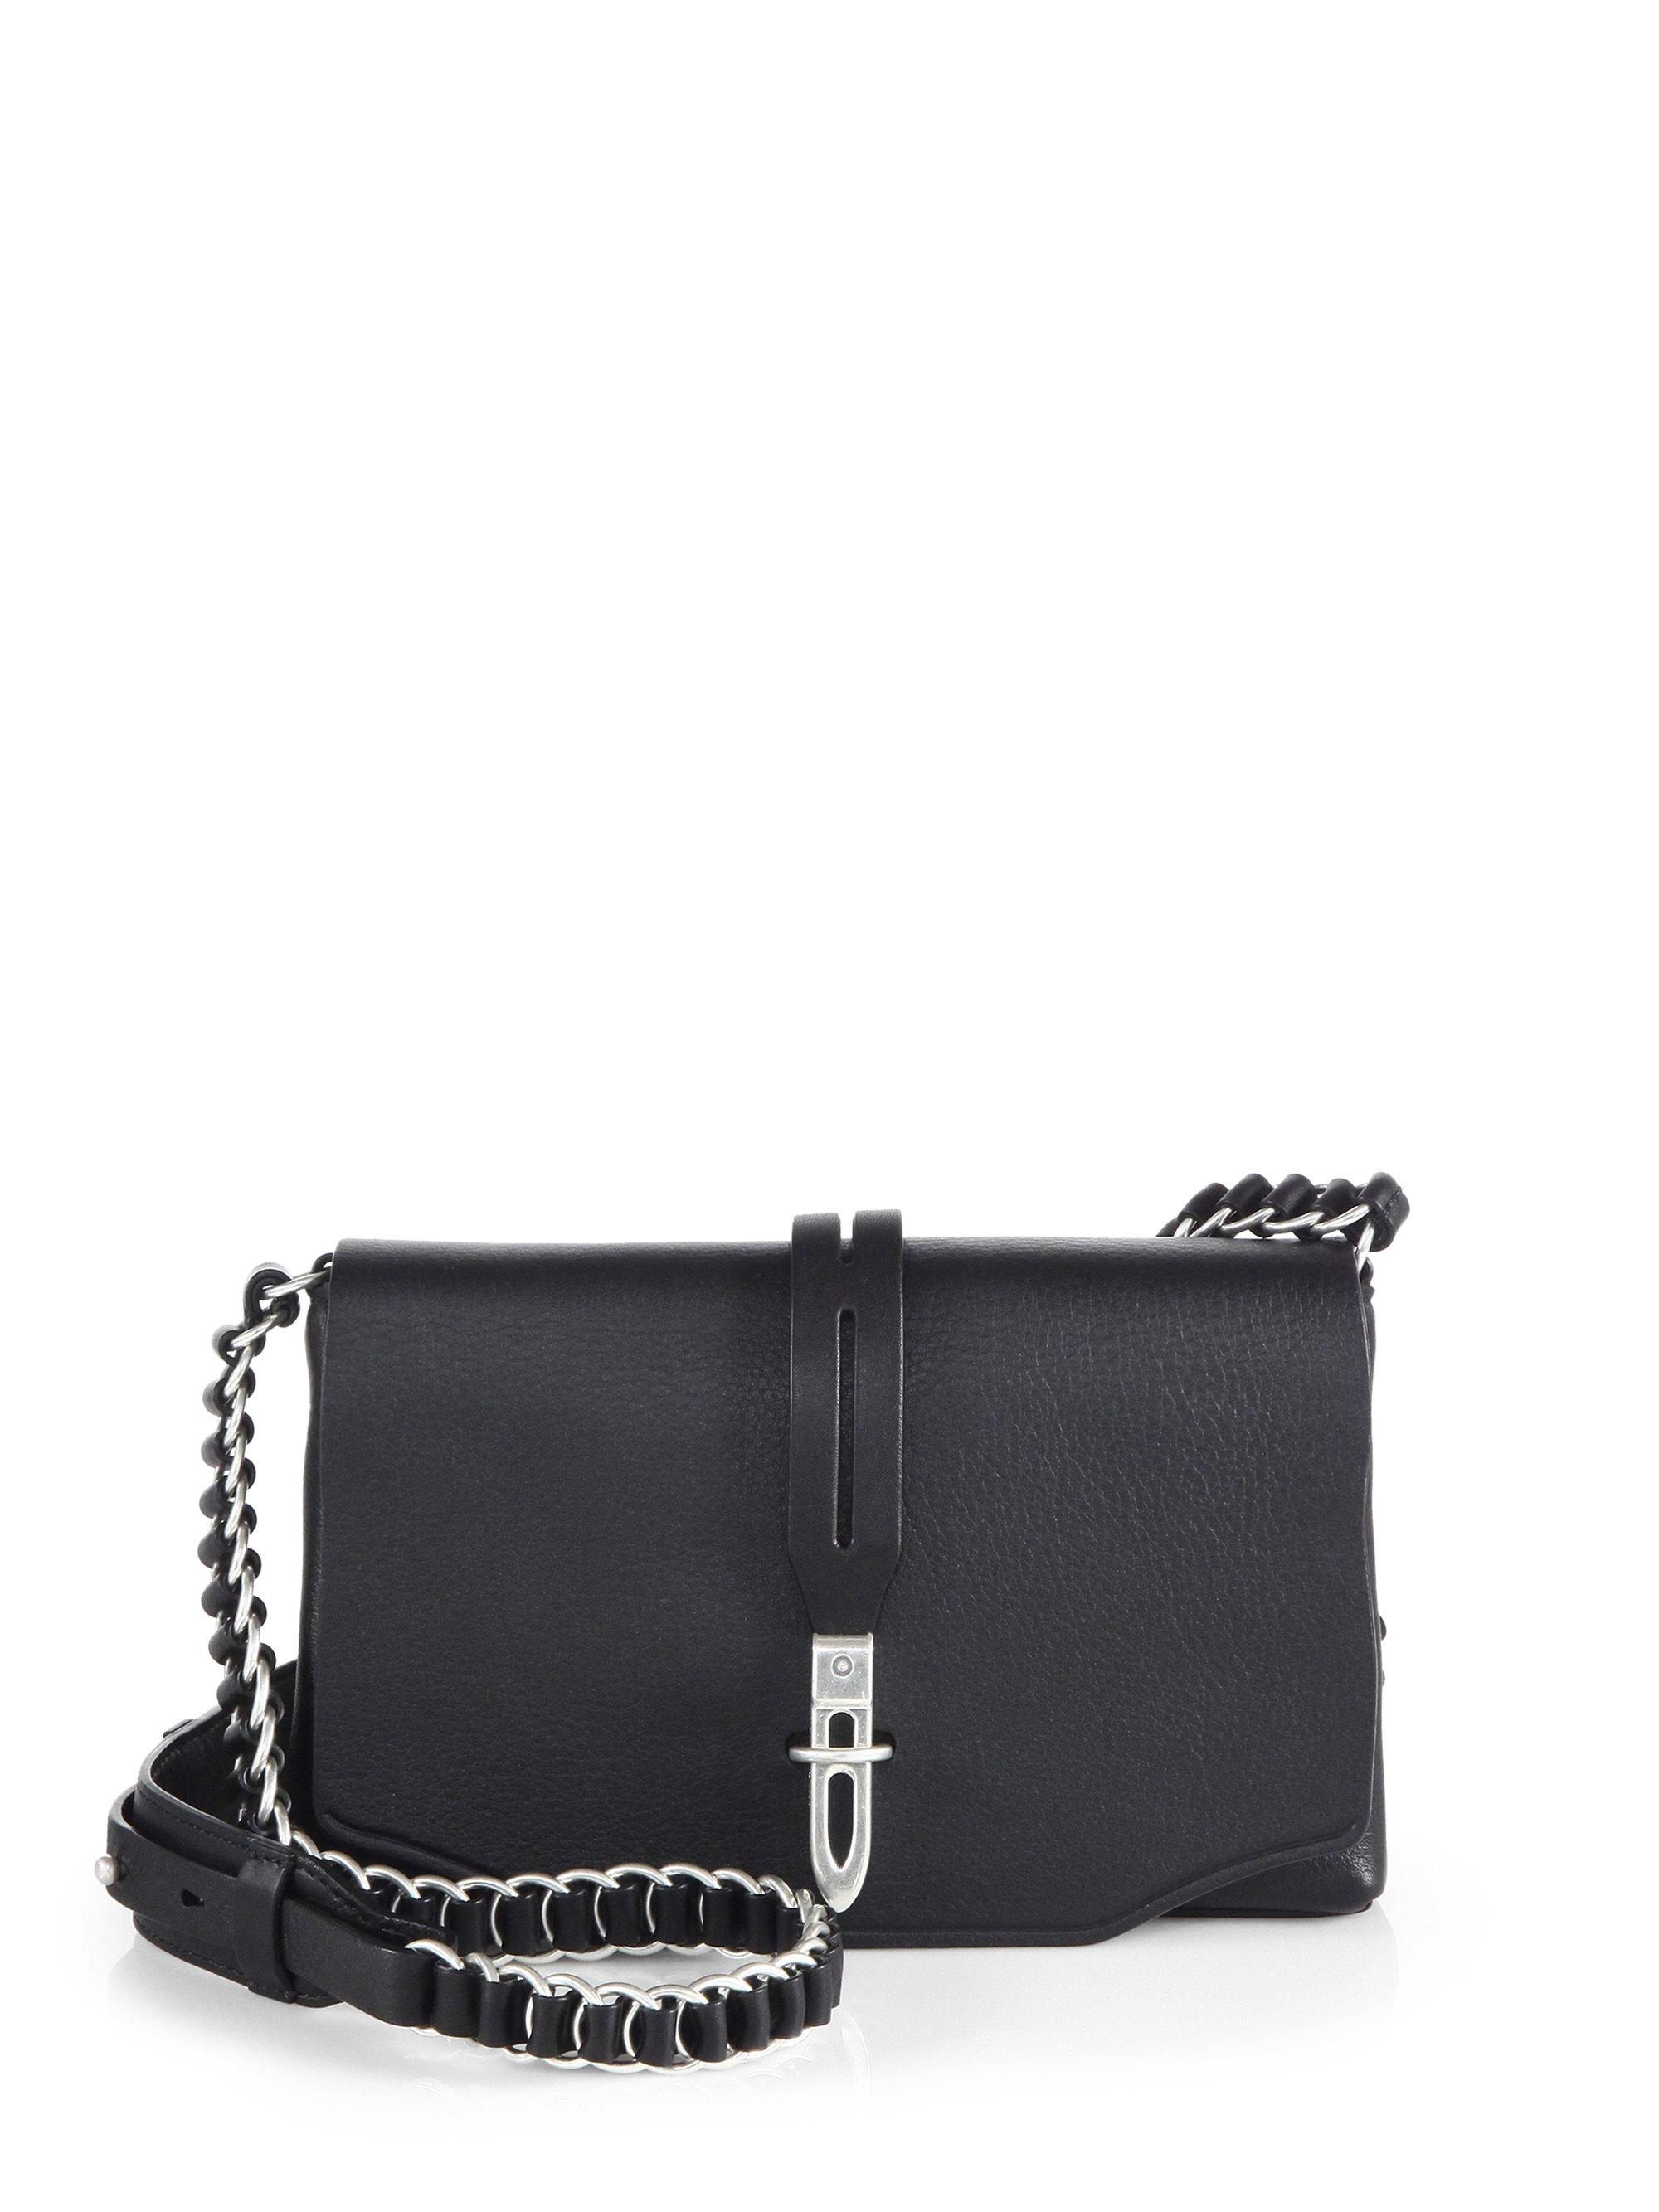 rag bone enfield mini crossbody bag in black lyst